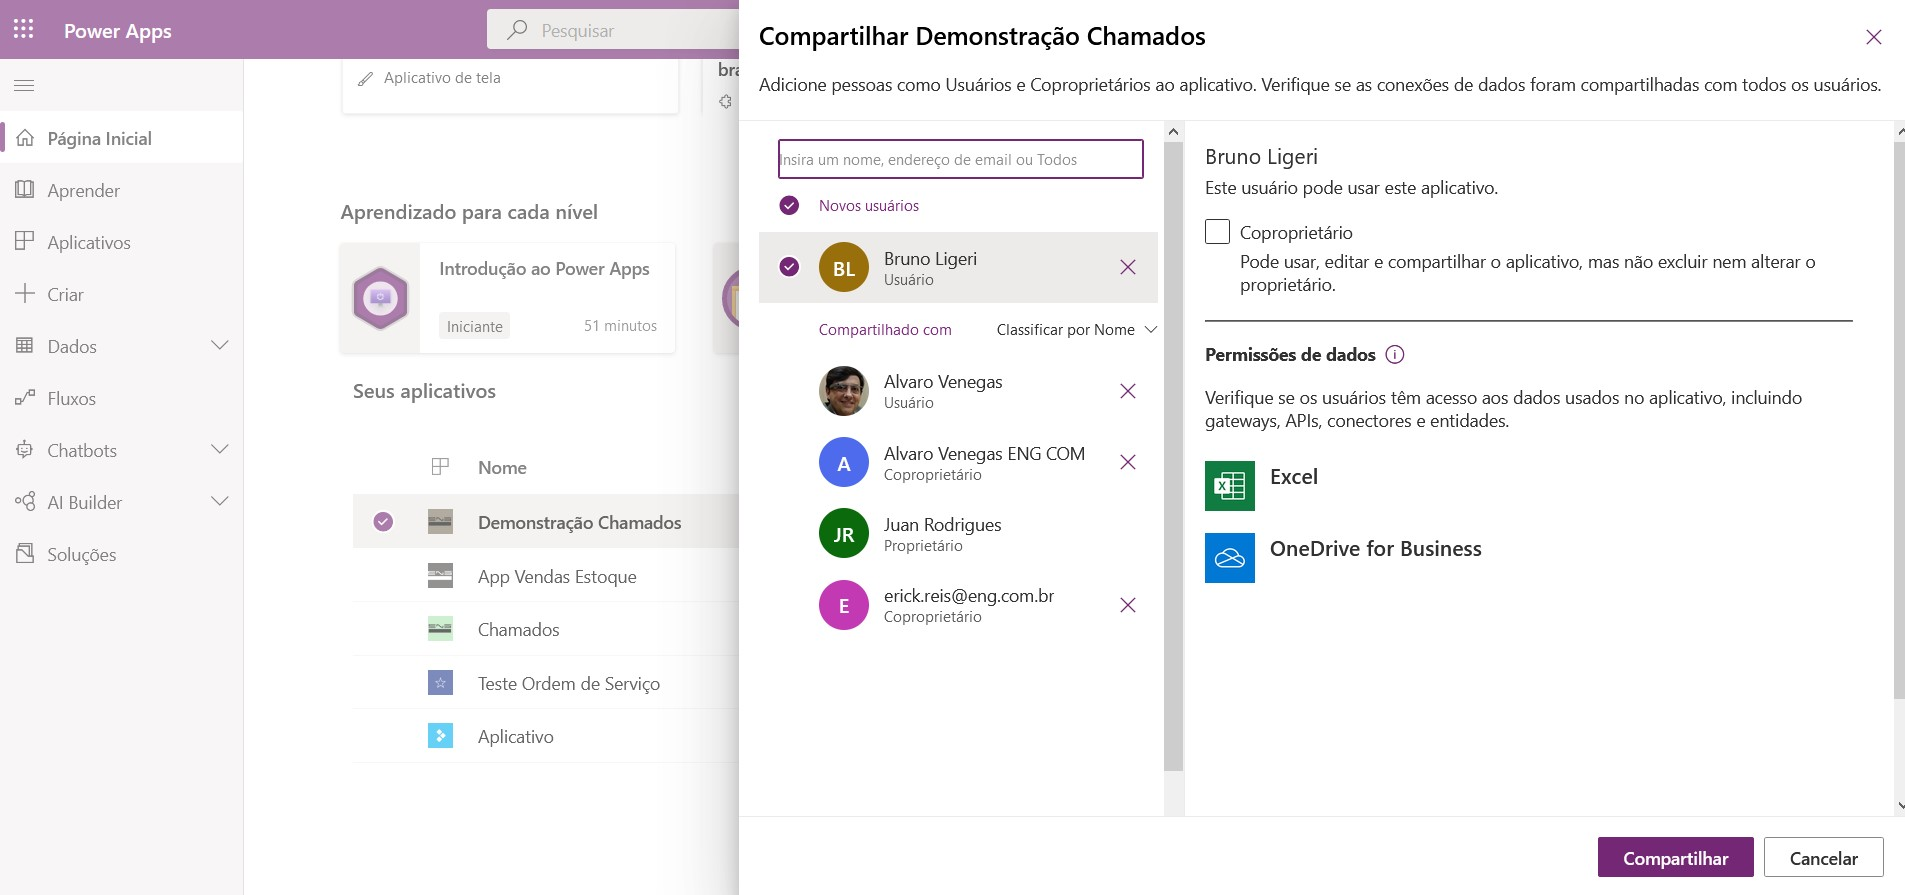 retirar-do-compartilhamento-power-apps-eng-dtp-multimidia